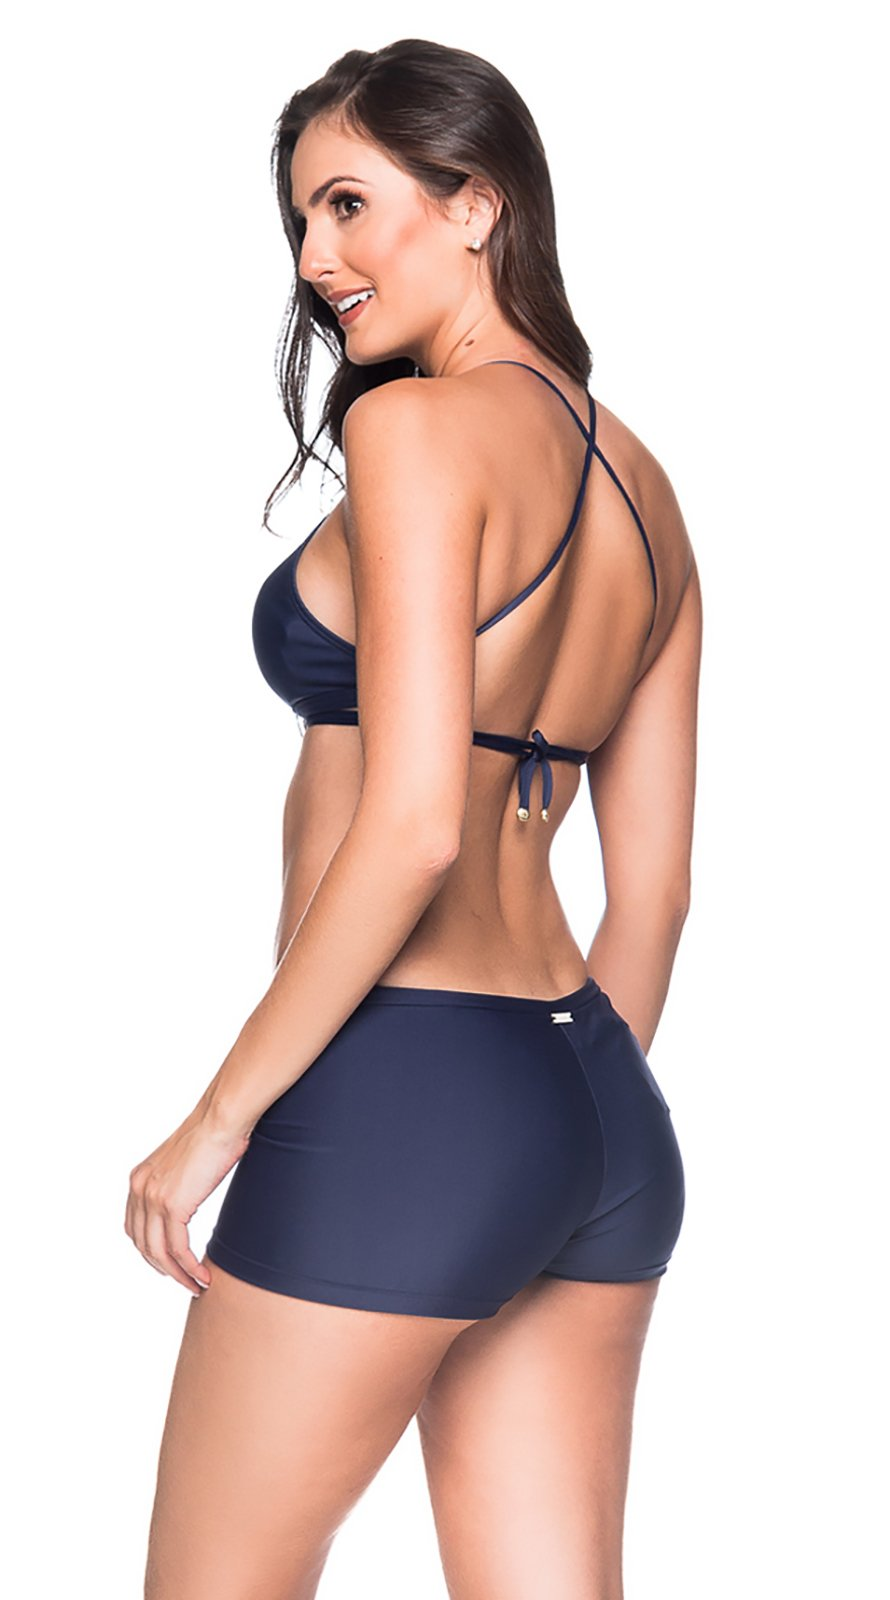 7f115f66f5f0 Bikini Azul Marino Con Crop Top Y Braguita Pantaloncito - Cruzado Miramar